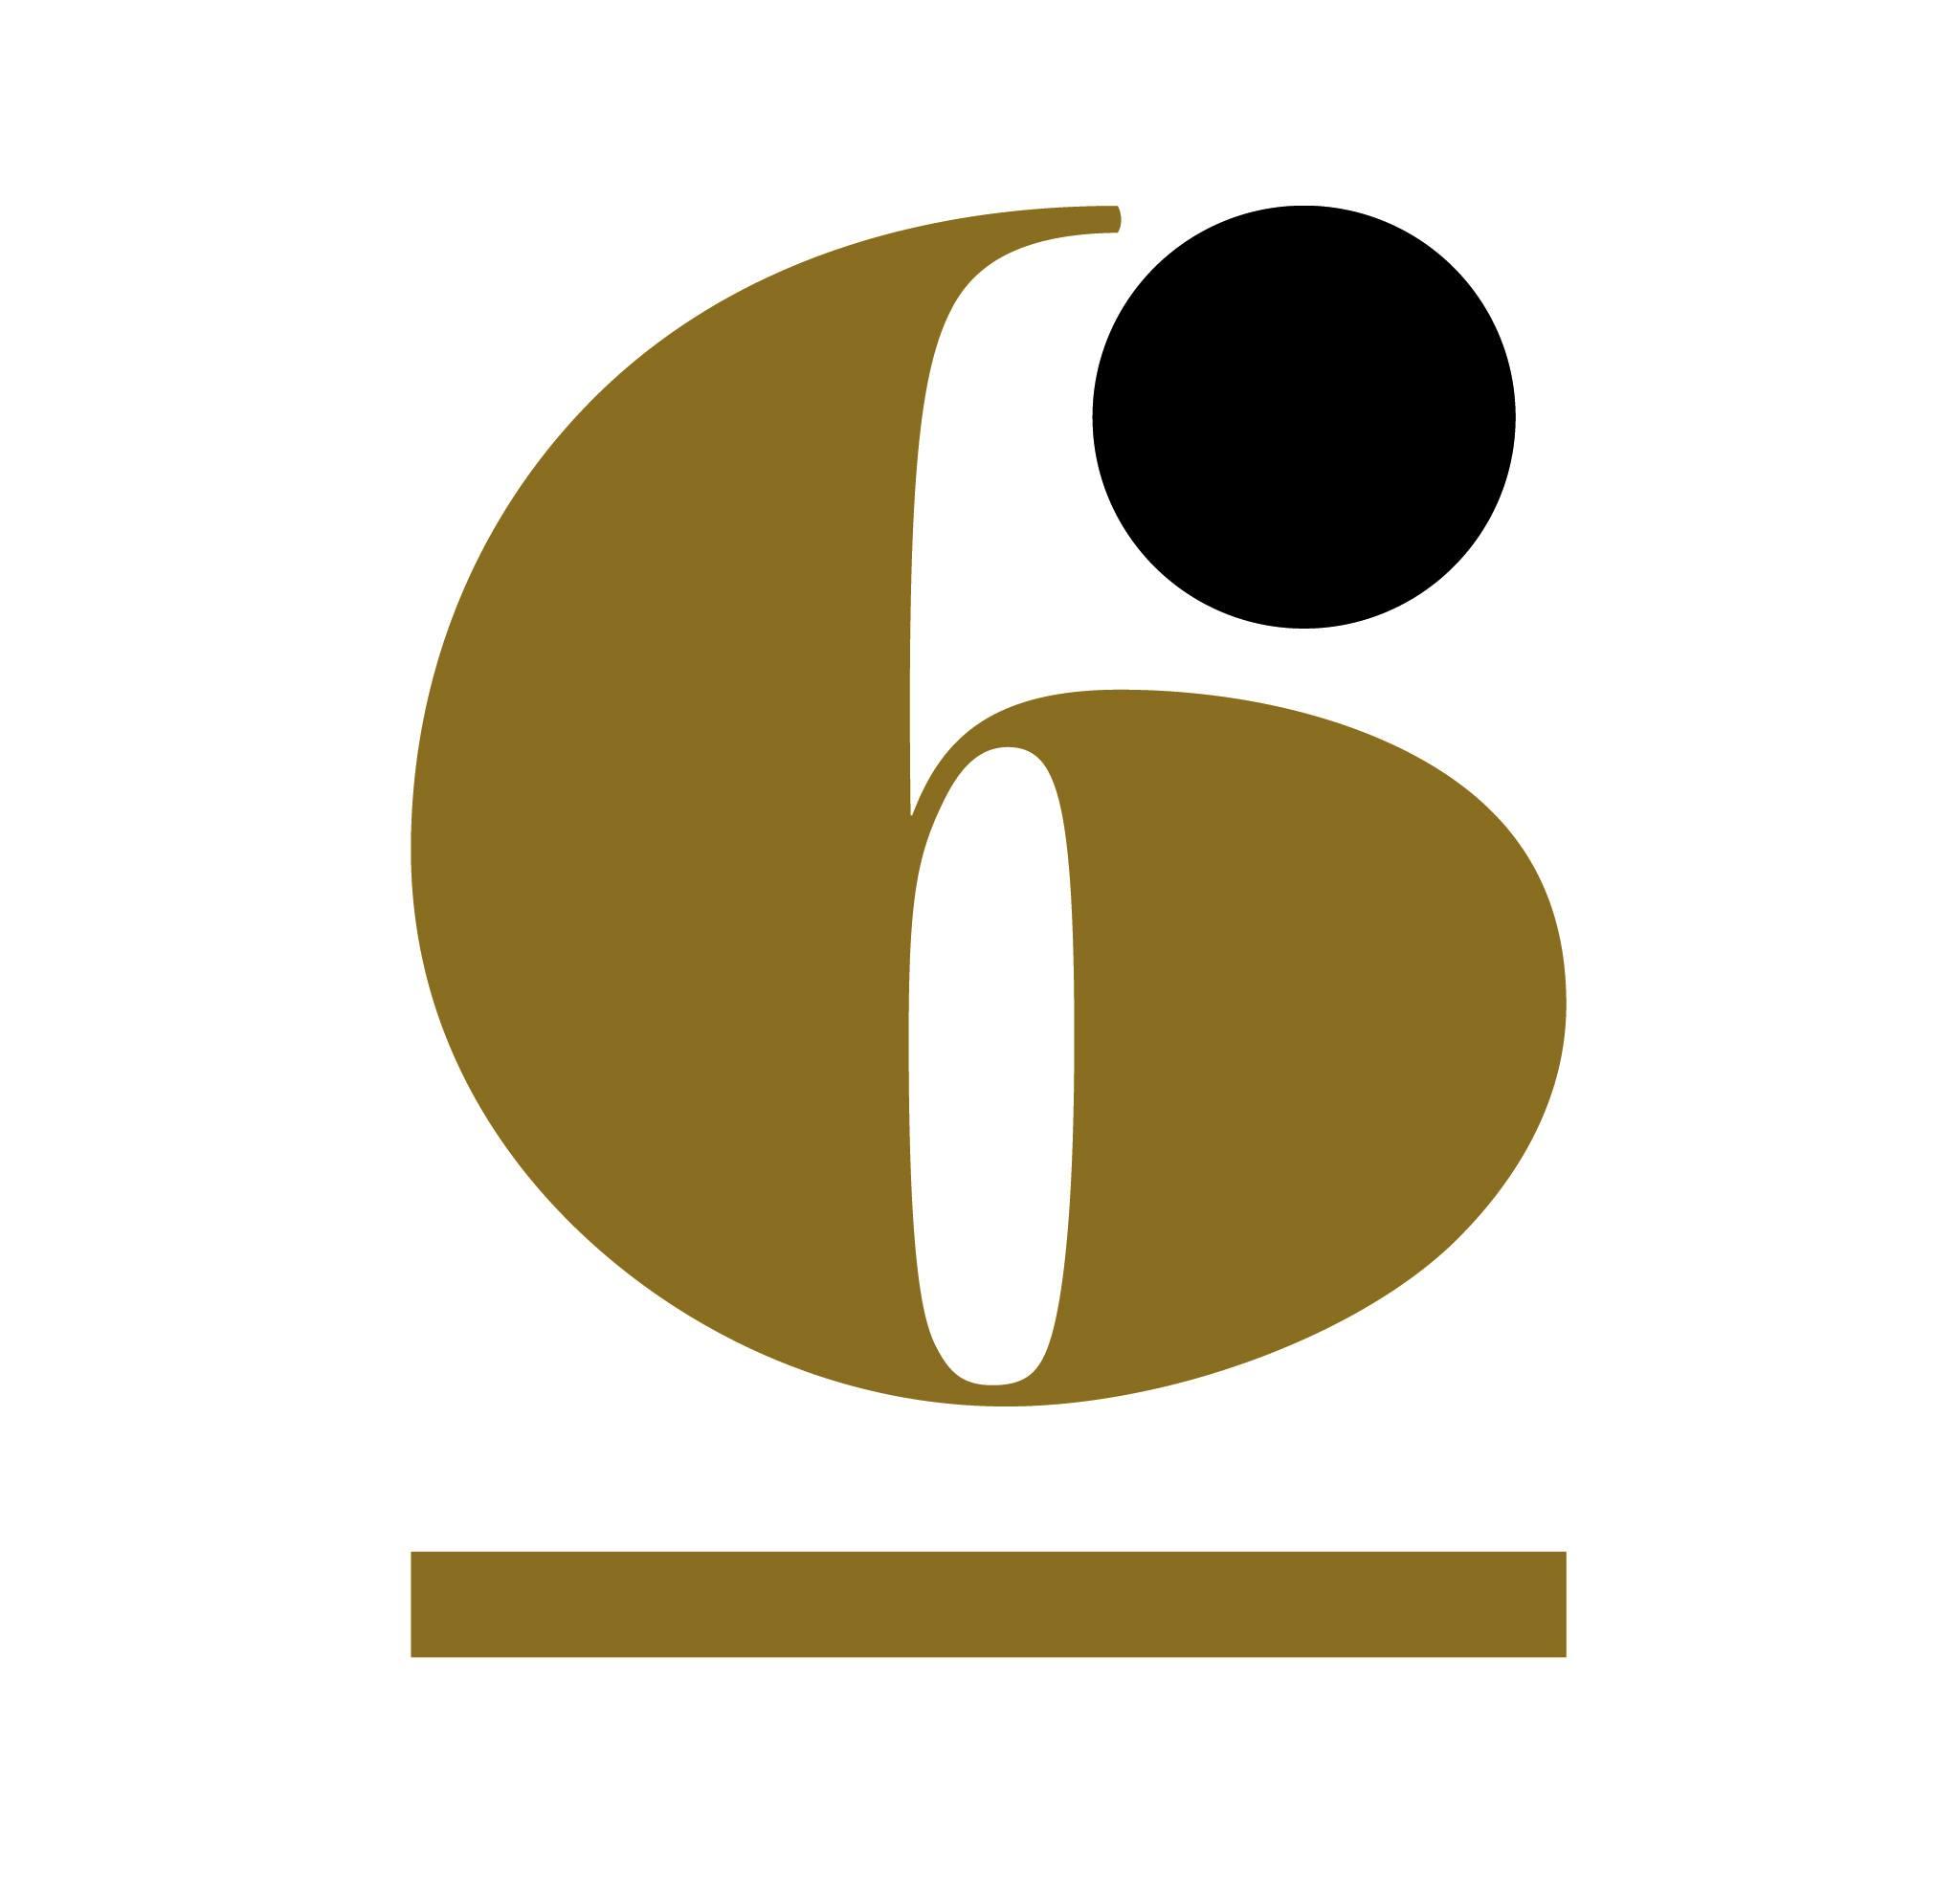 6mm_logo.jpg